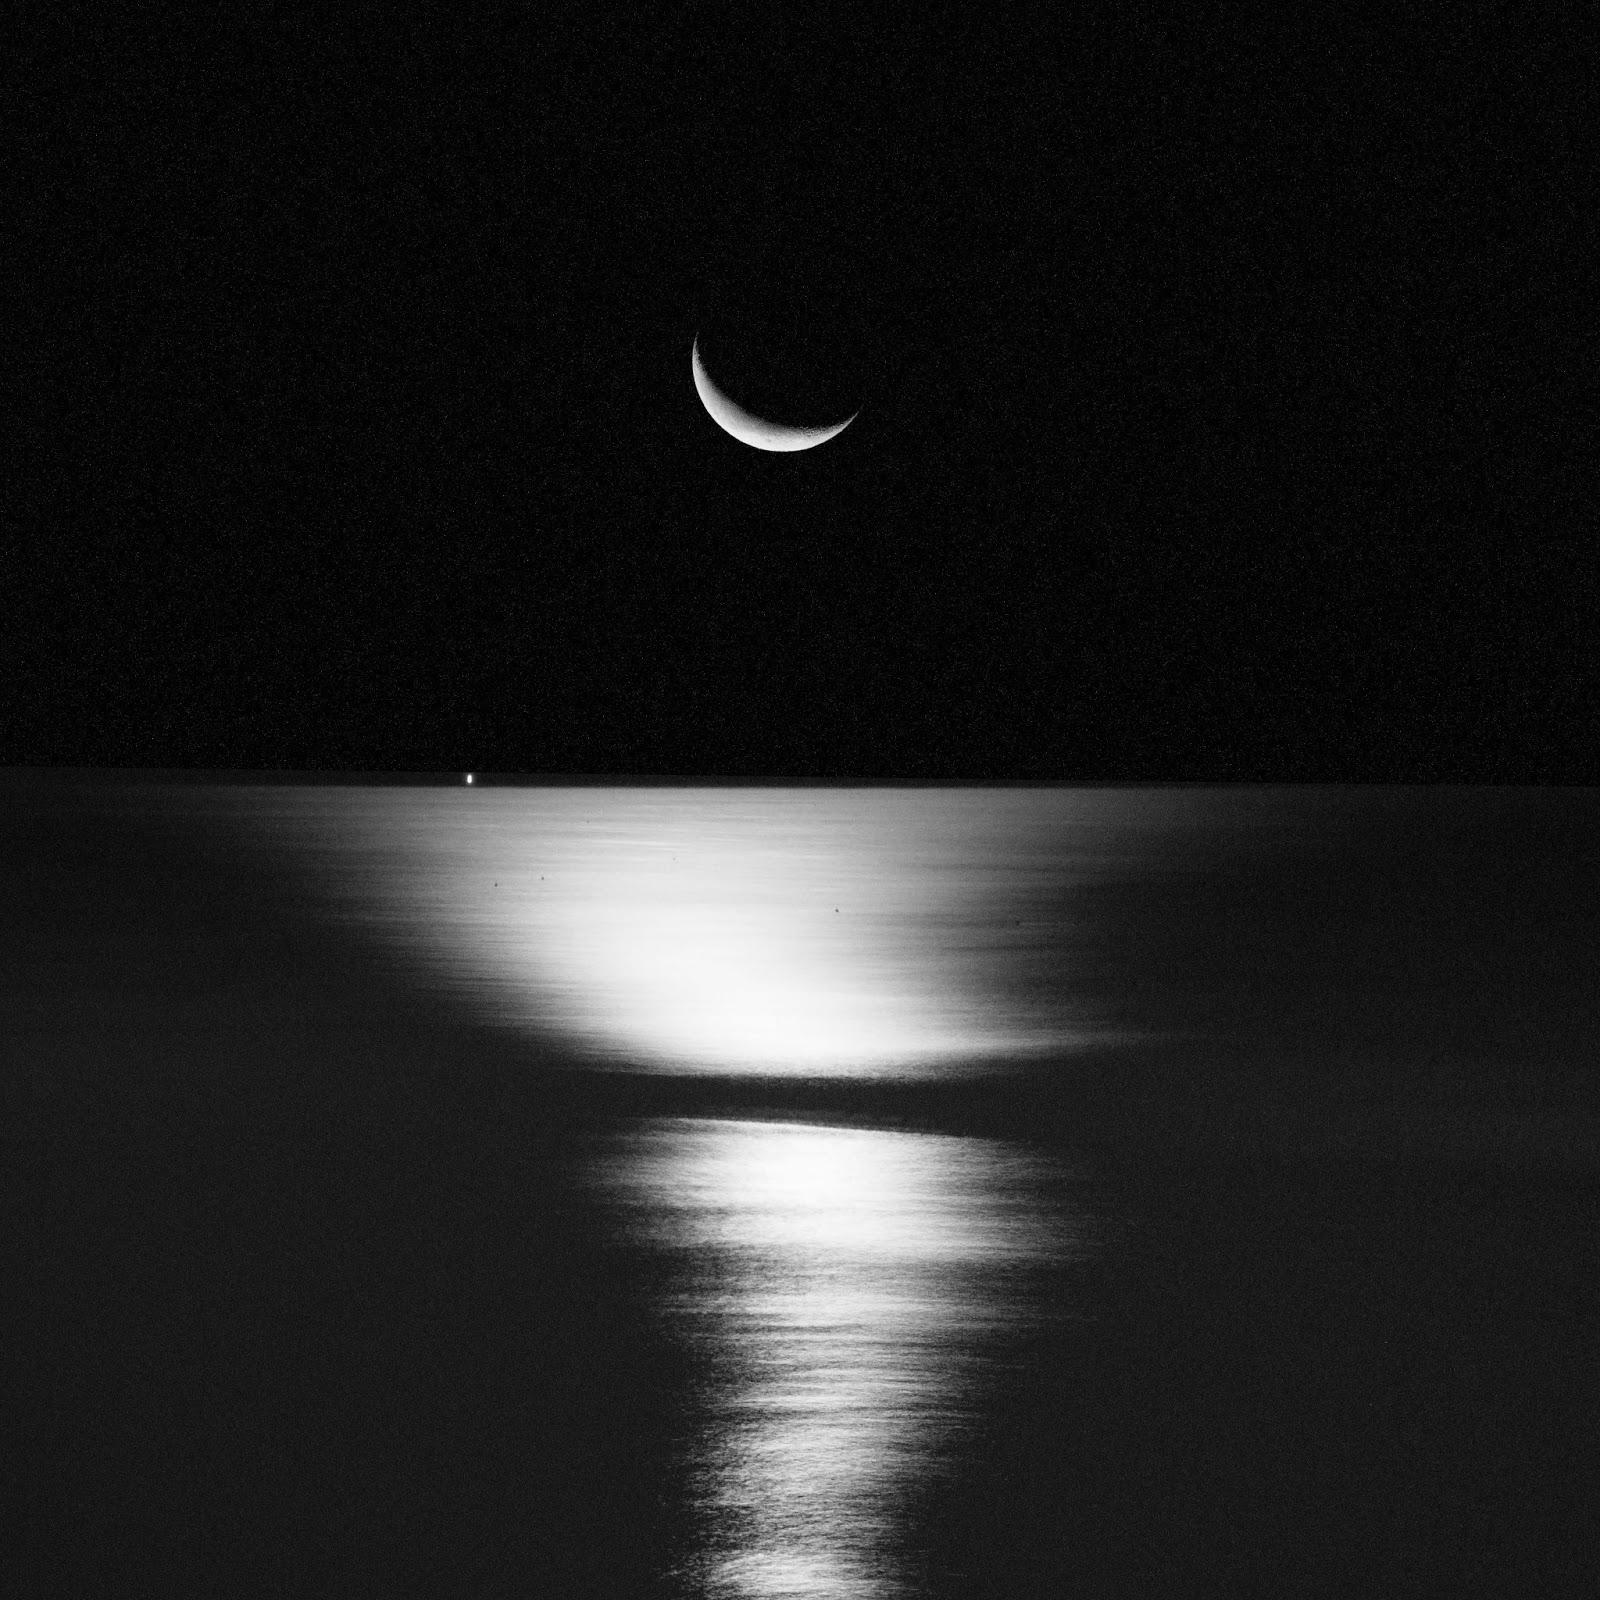 Moonrise rockport maine 2012